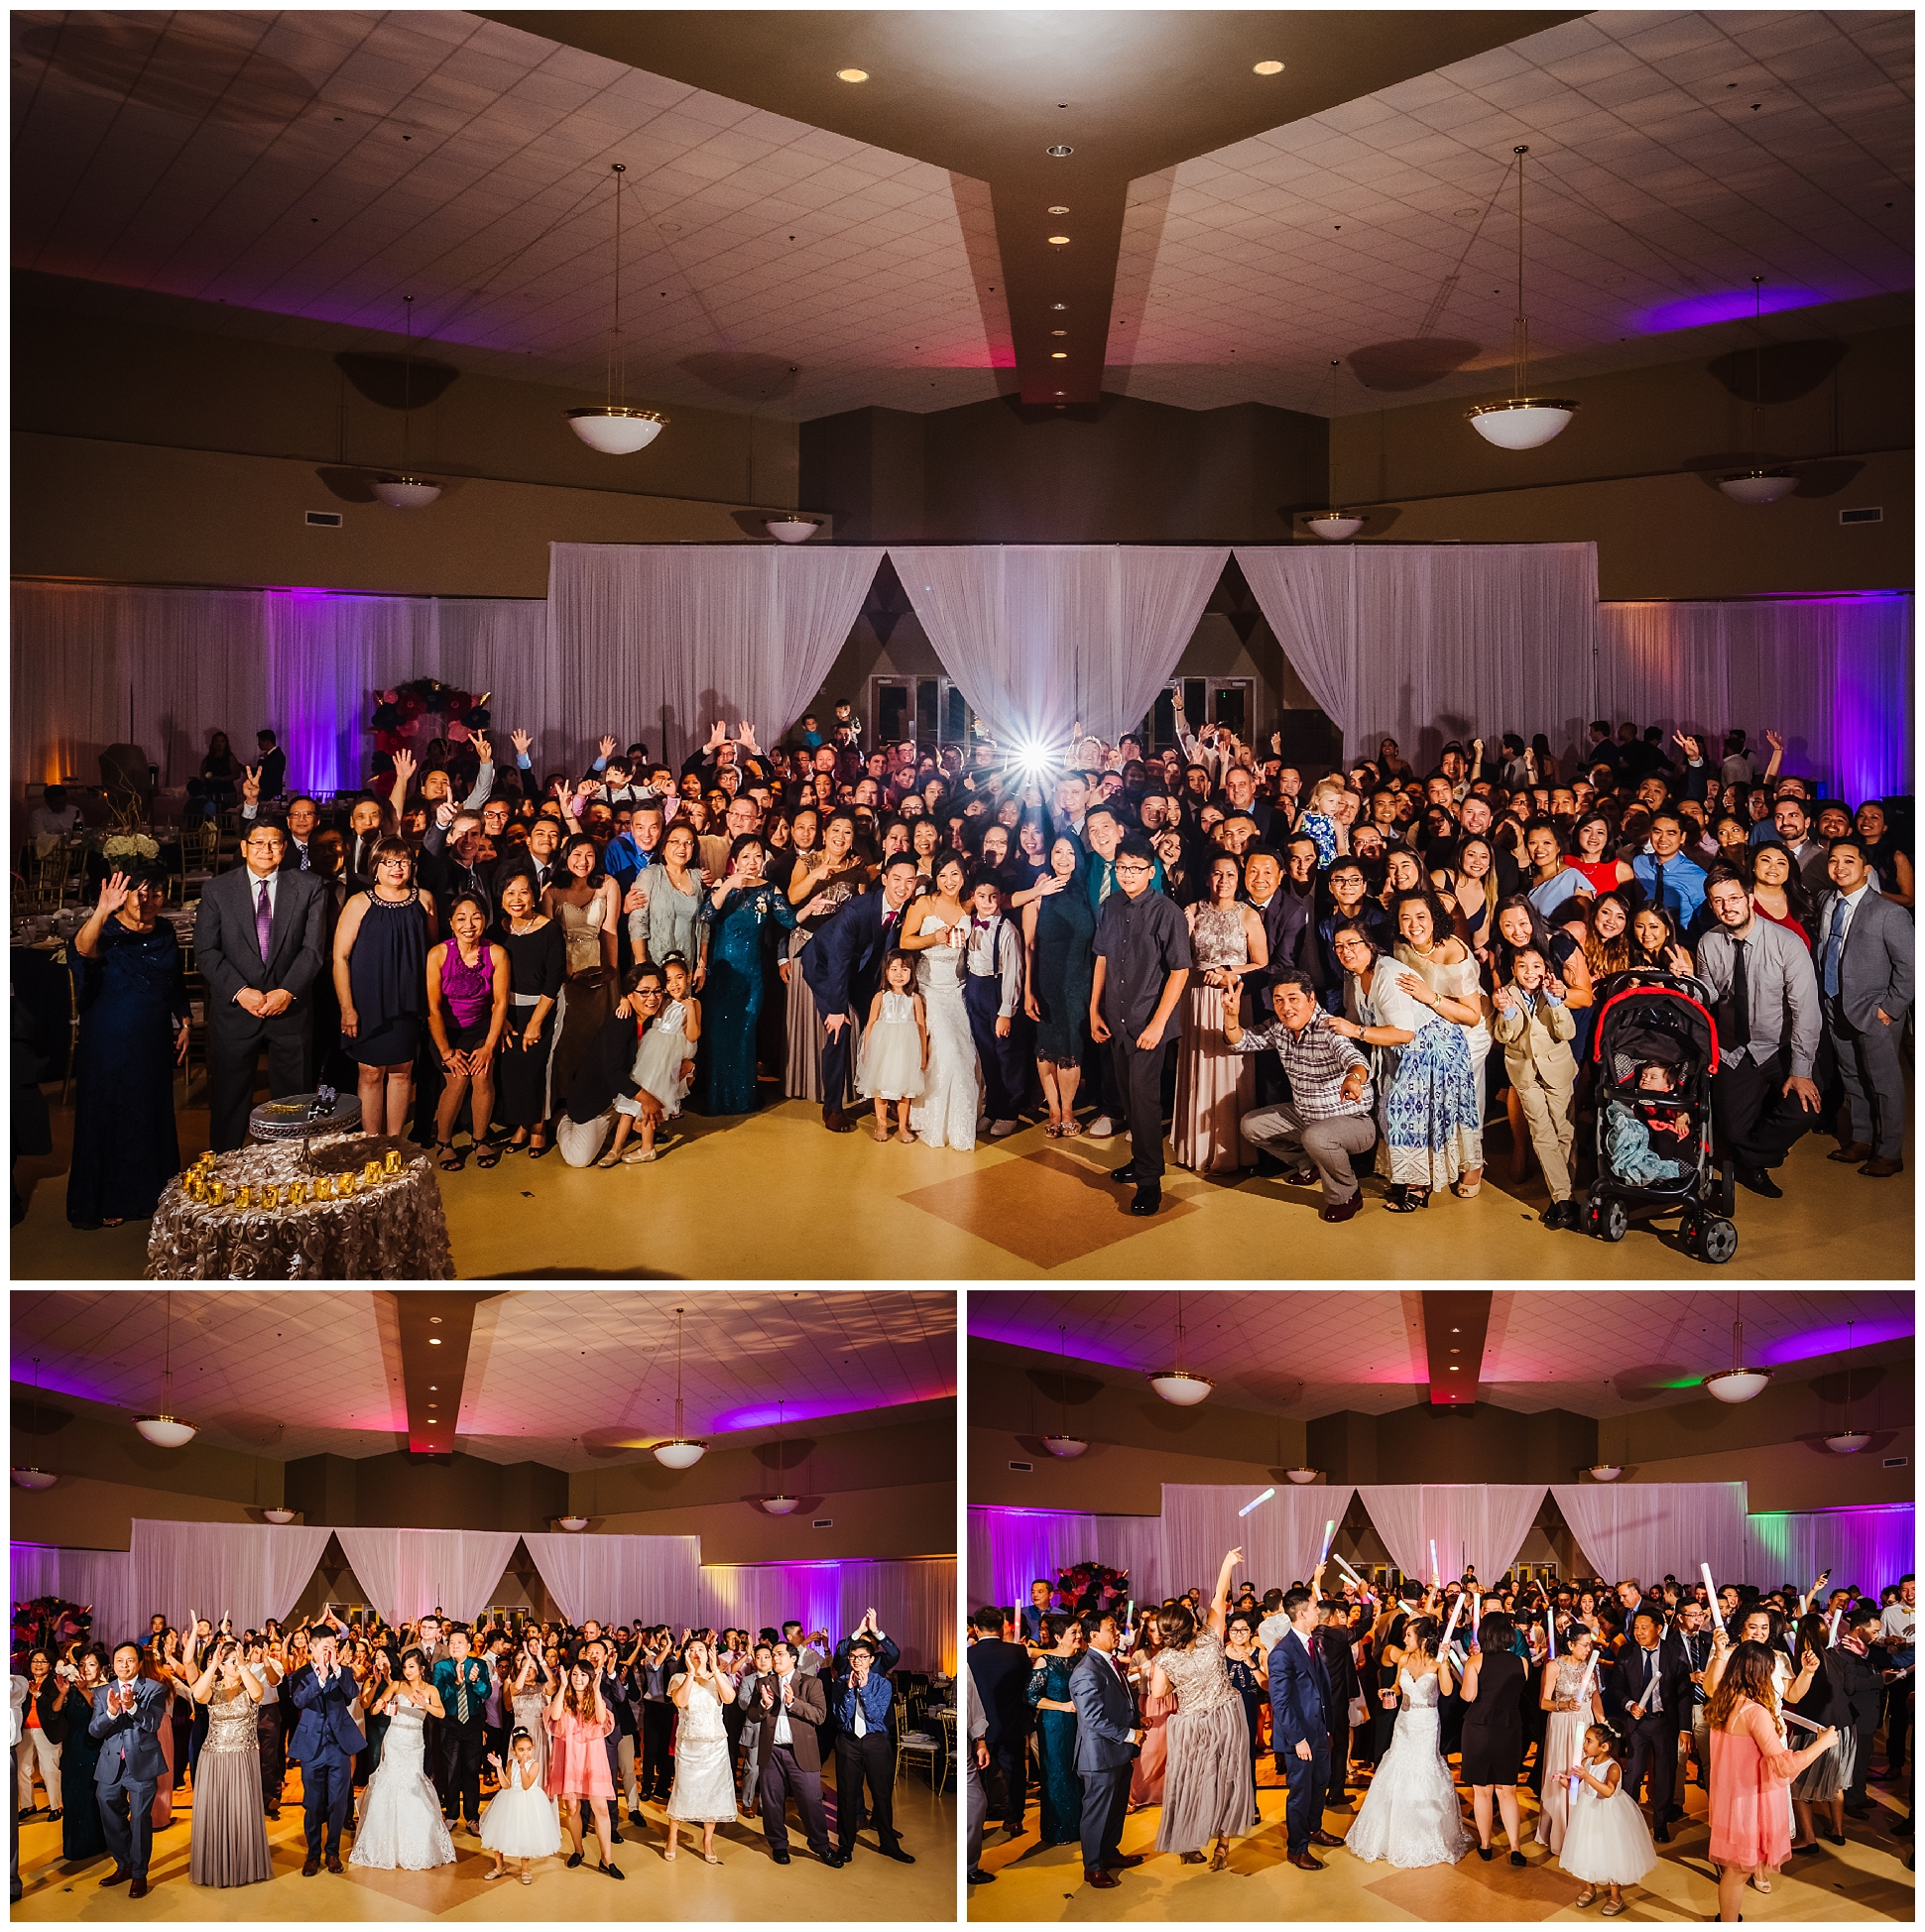 tampa-wedding-photographer-philipino-colorful-woods-ballroom-church-mass-confetti-fuscia_0073.jpg